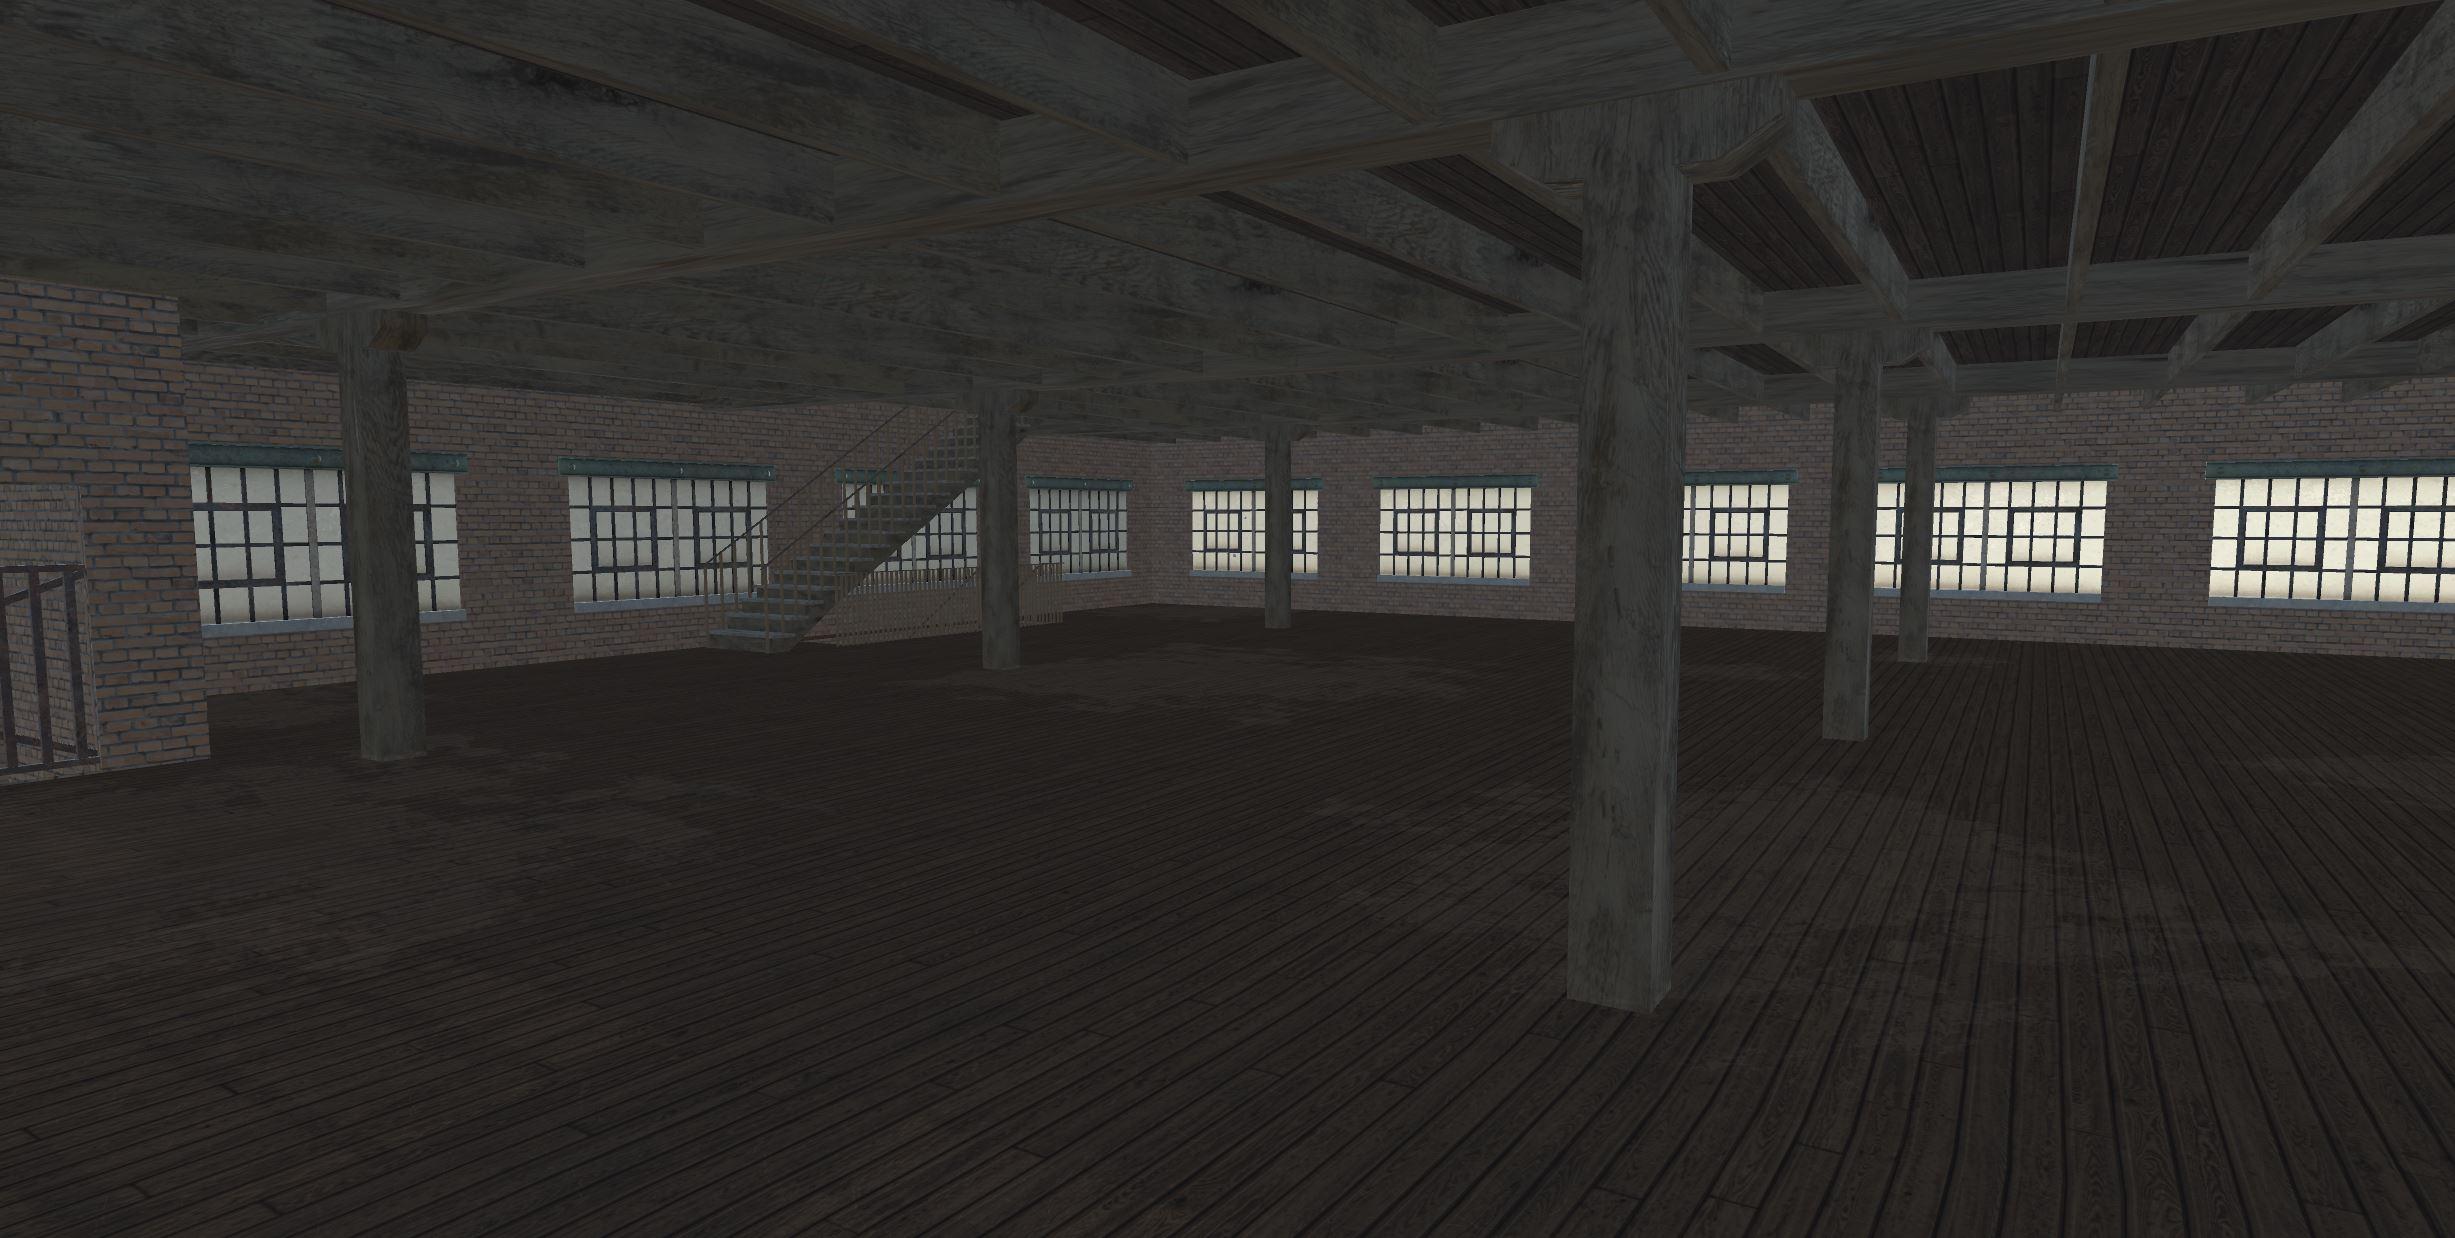 Warehouse_6